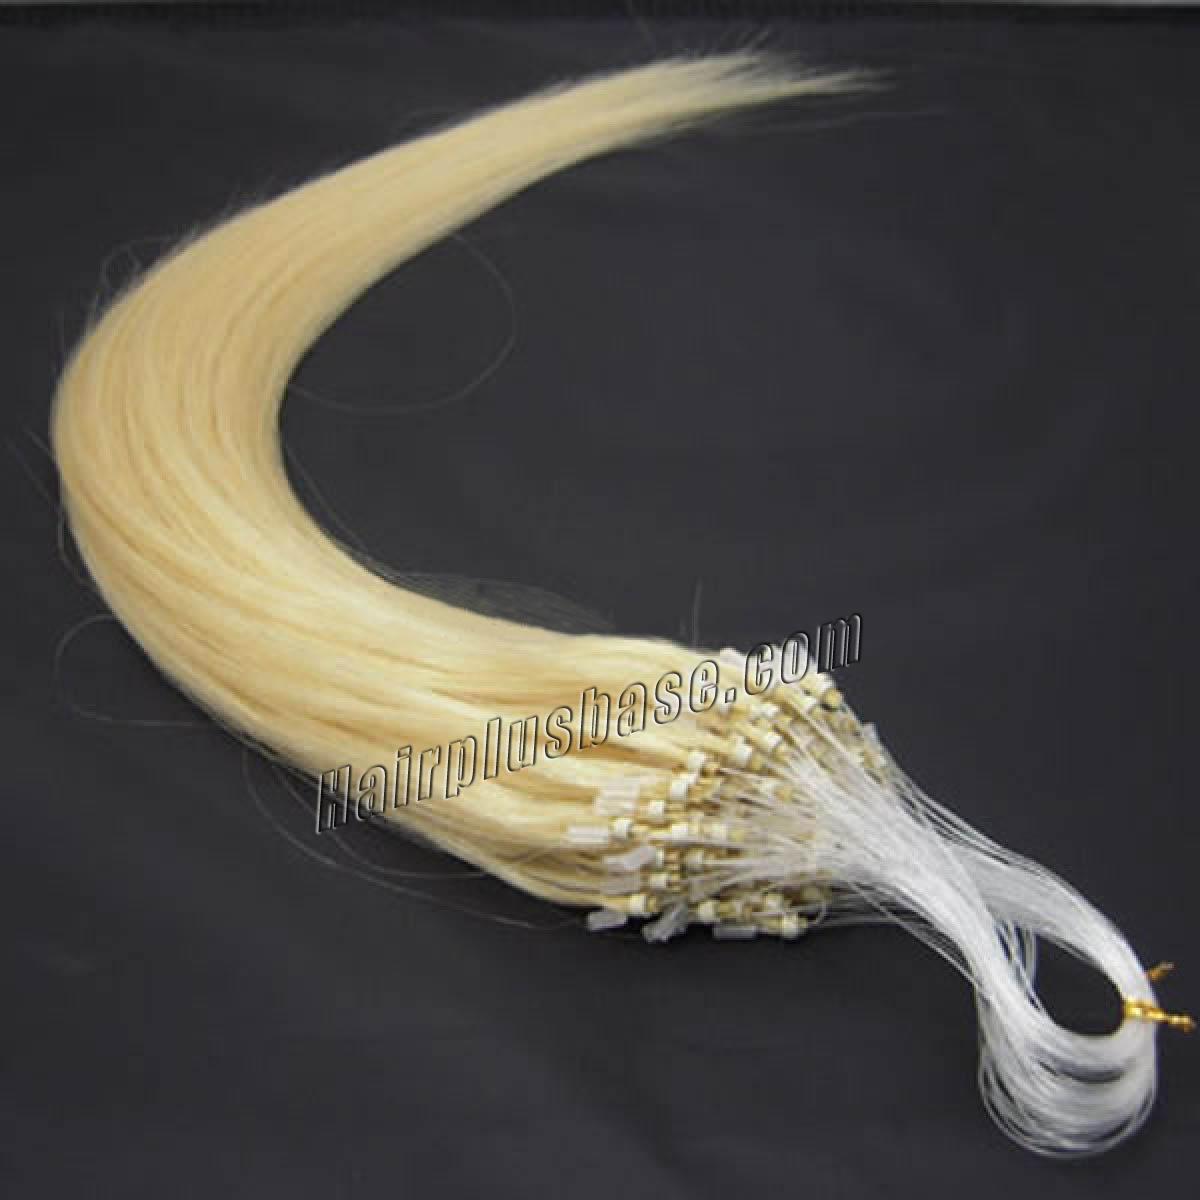 16 Inch #613 Bleach Blonde Micro Loop Human Hair Extensions 100S no 1